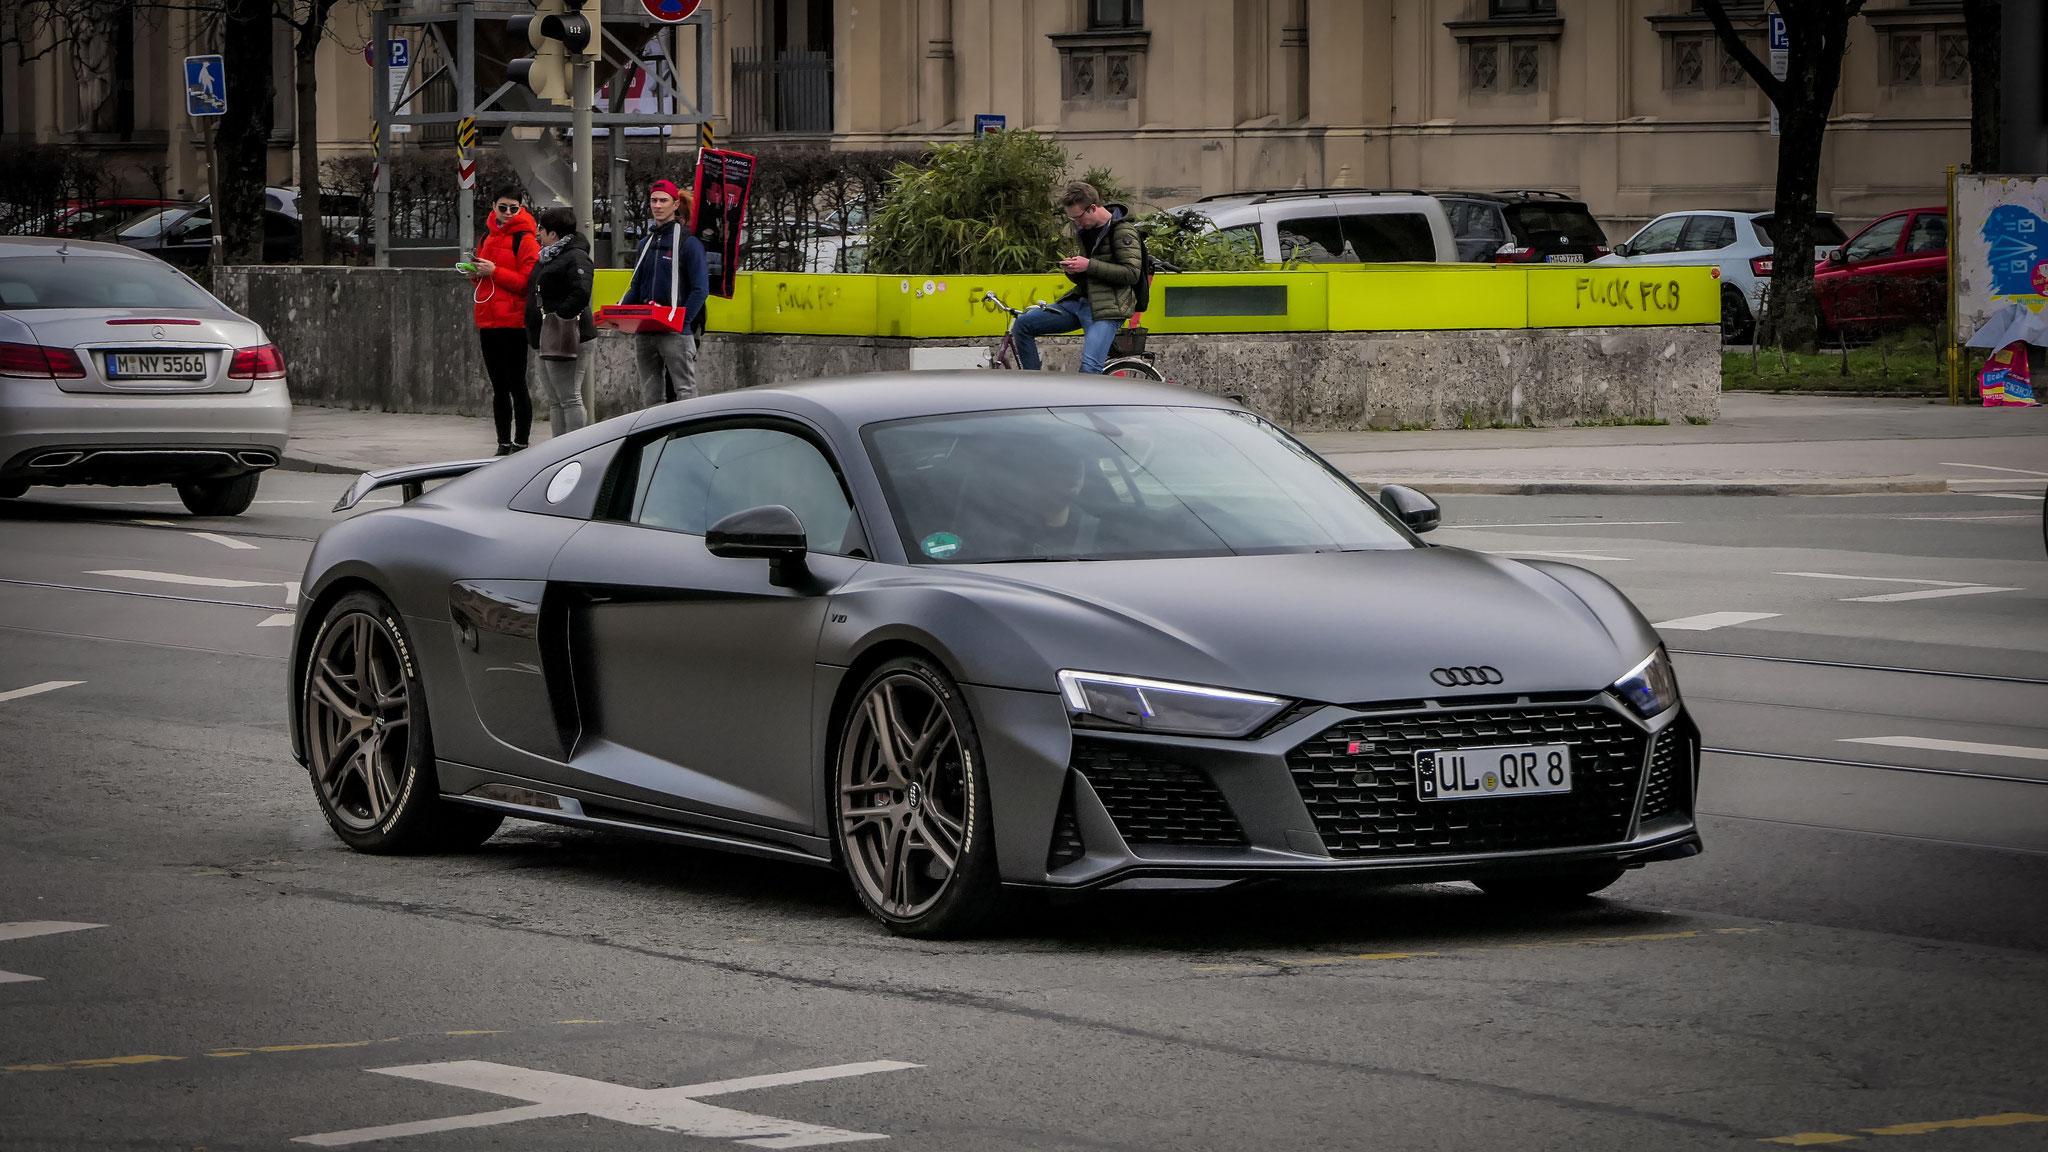 Audi R8 V10 Decennium - UL-QR-8